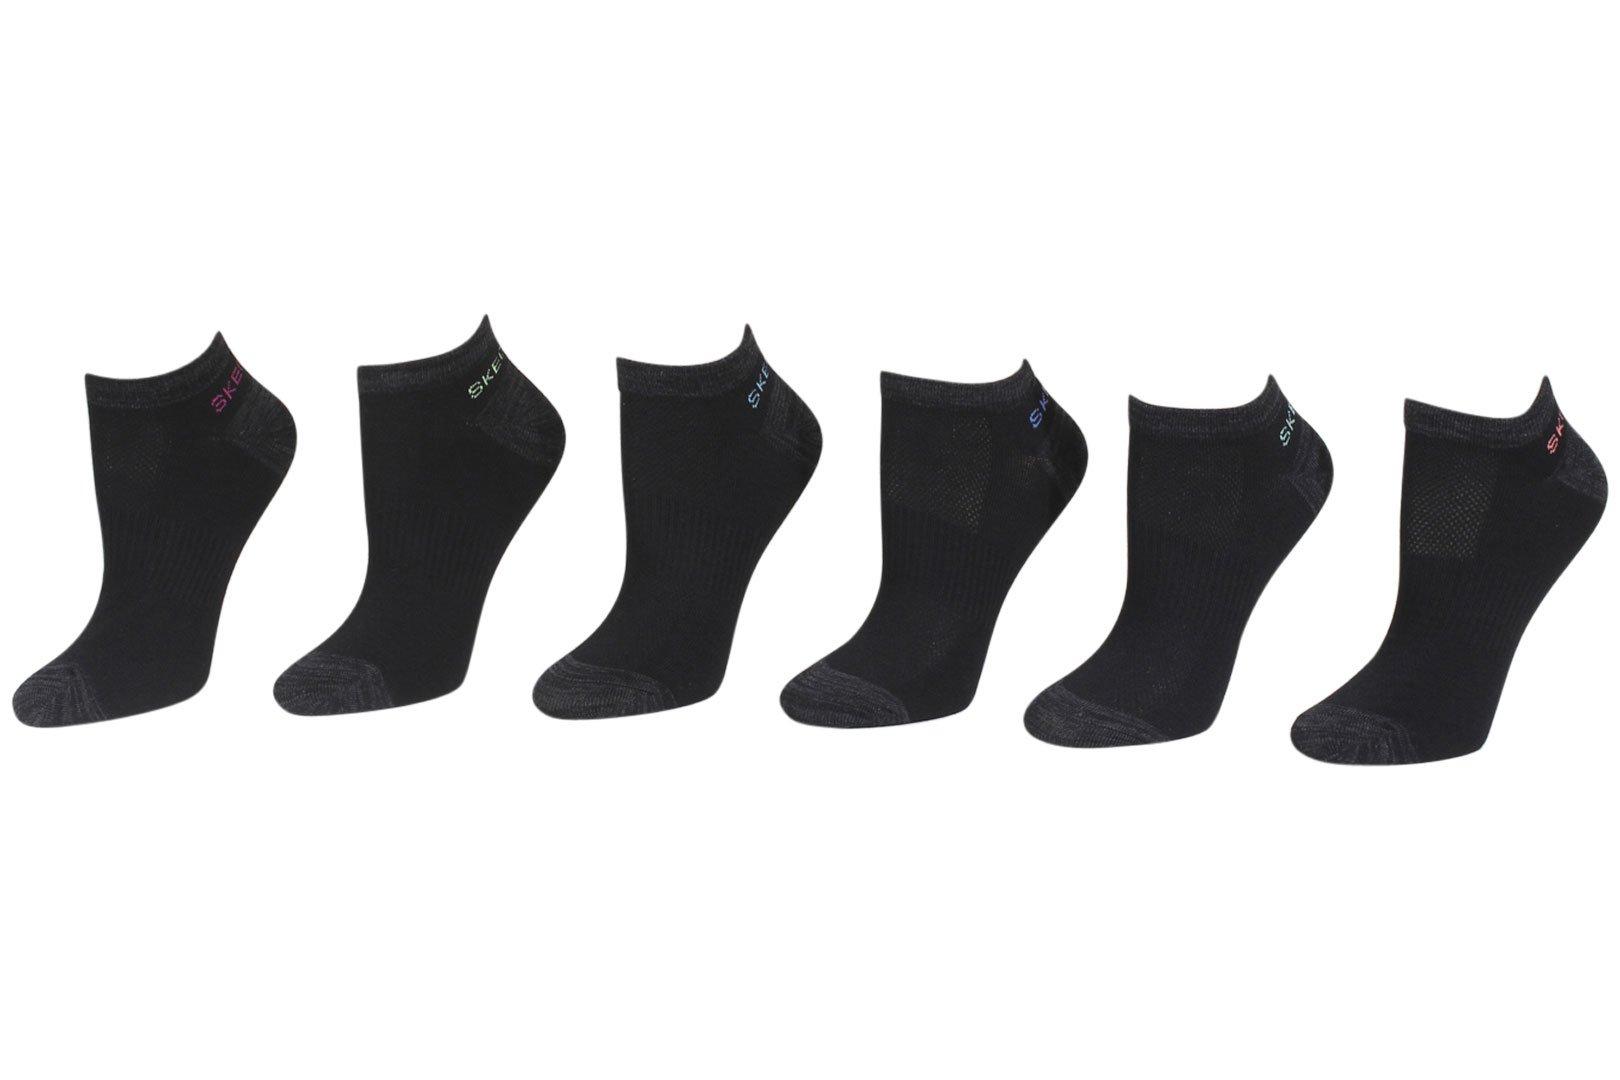 Skechers 6-Pairs Black/Pink Lightweight Low Cut Socks Sz: 9-11 Fits 5-9.5